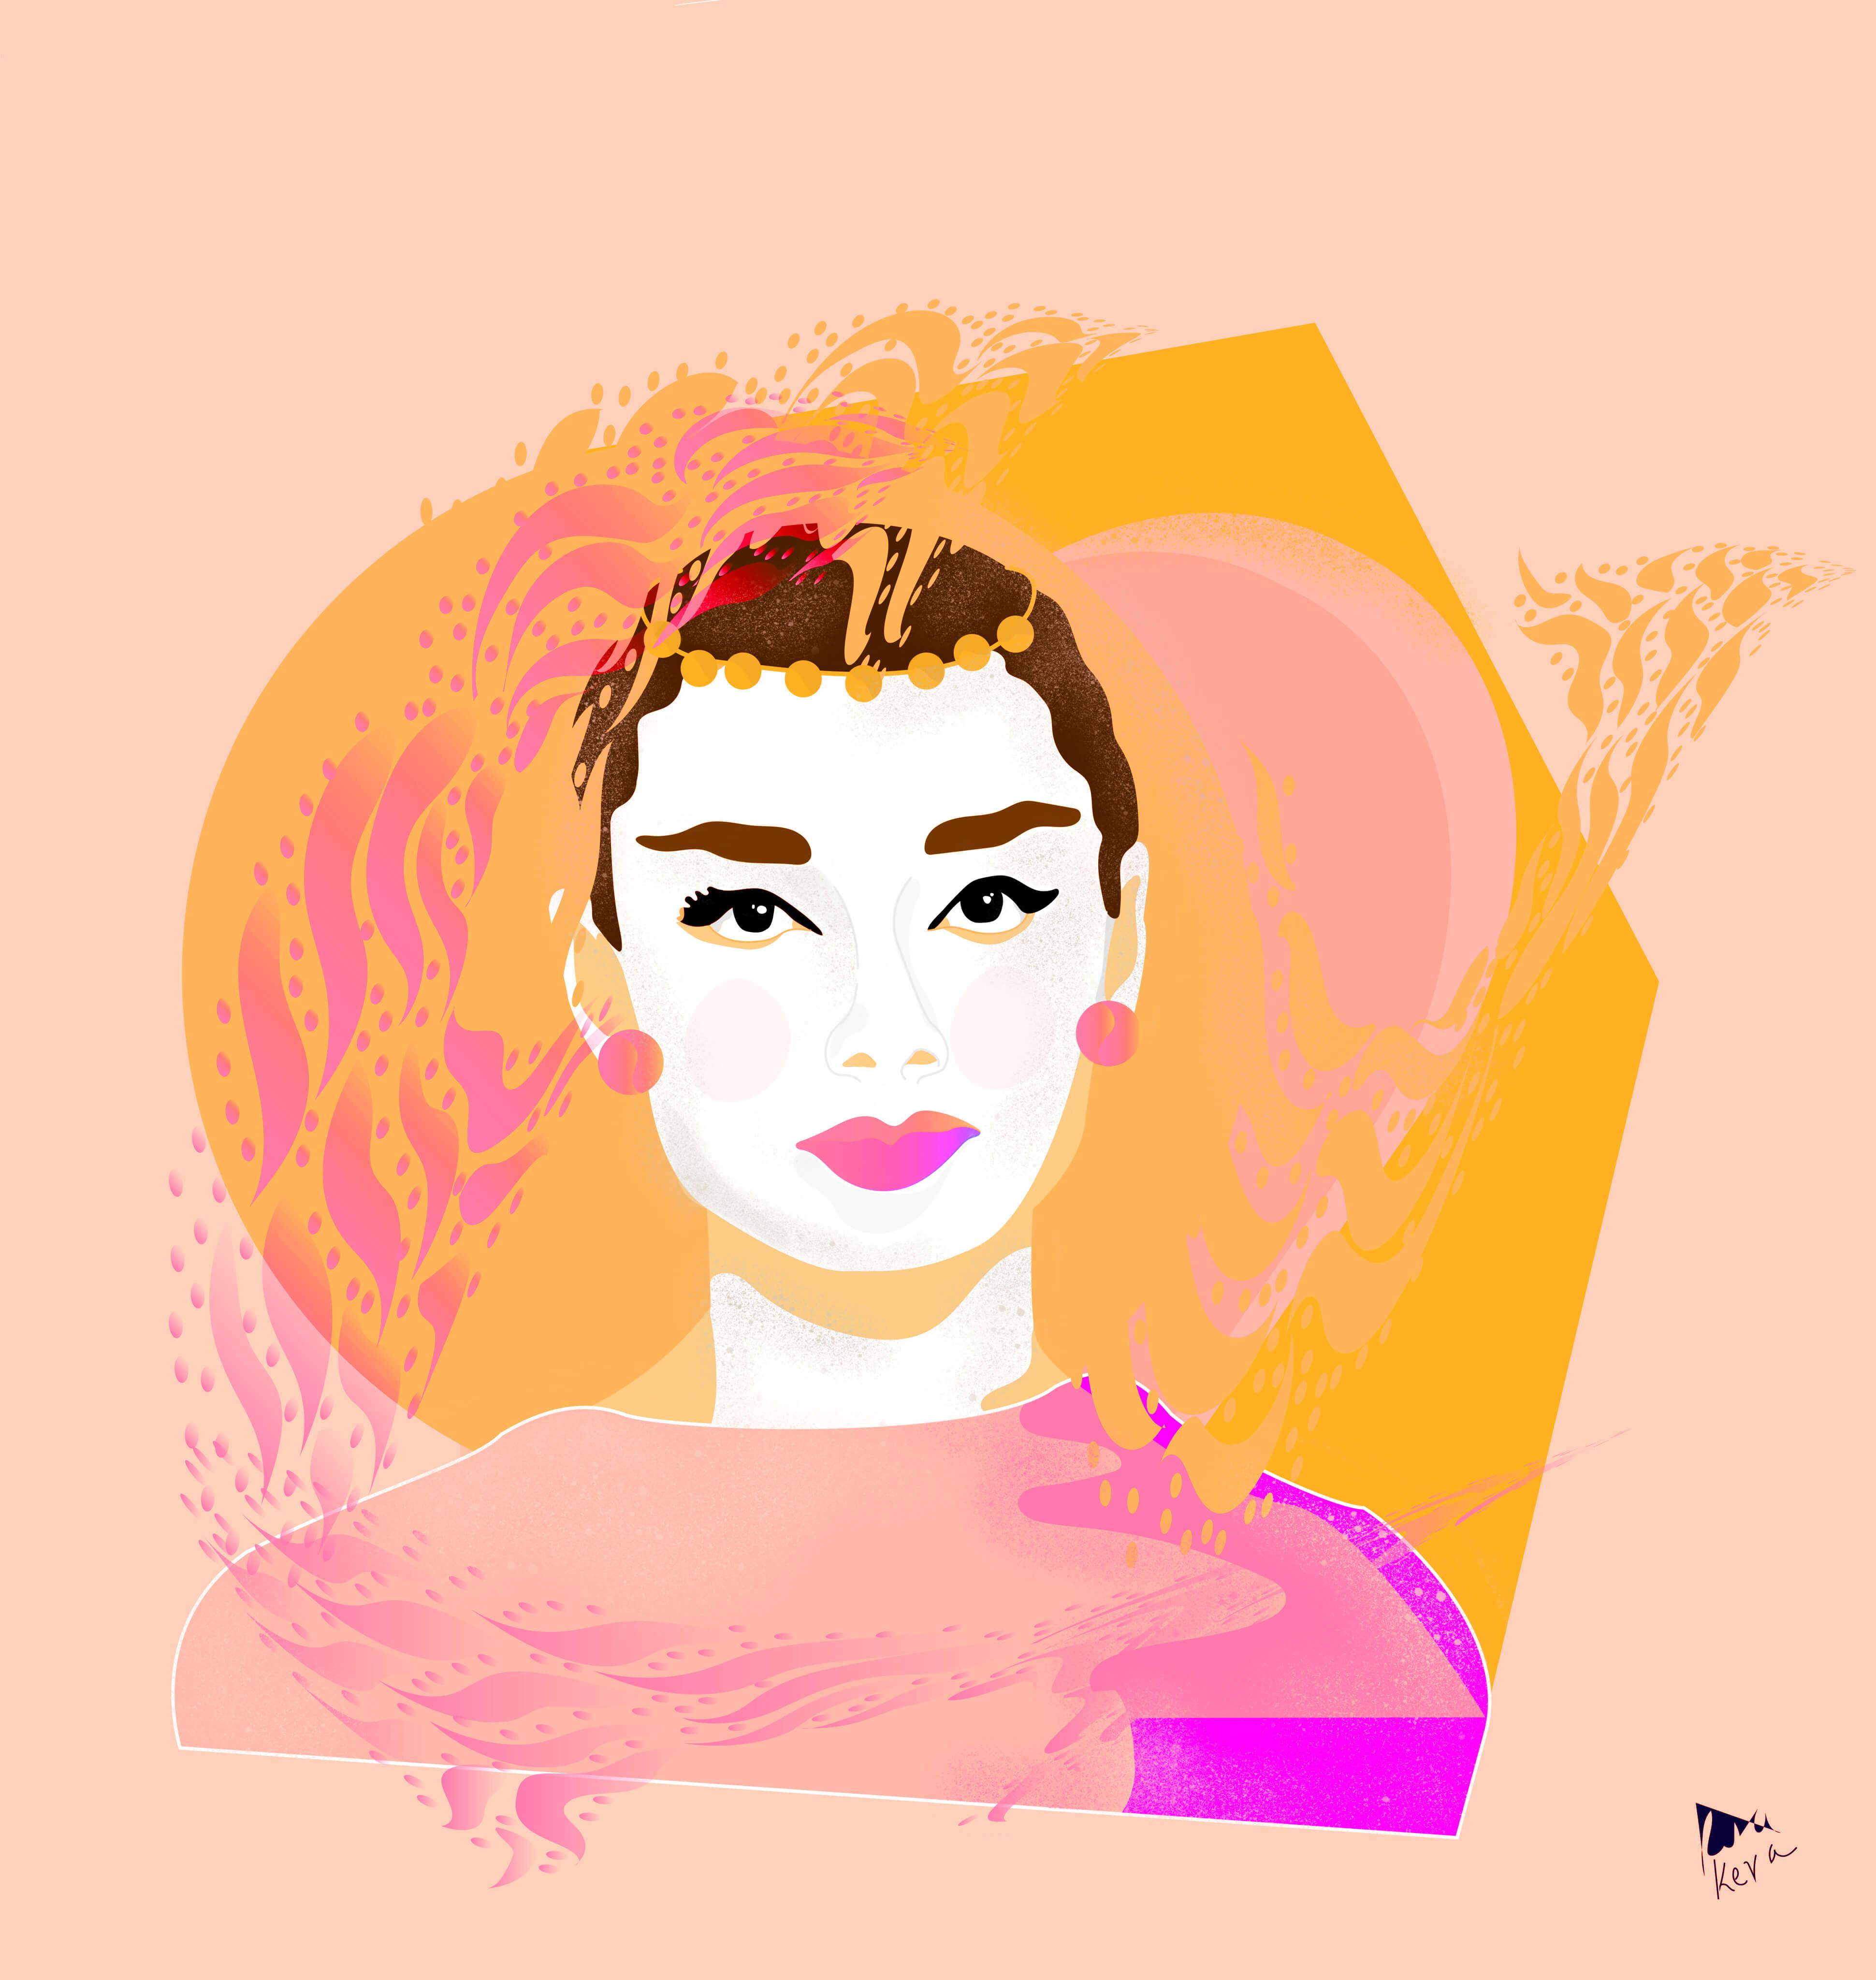 Audrey Hepburn in a colourful interpretation